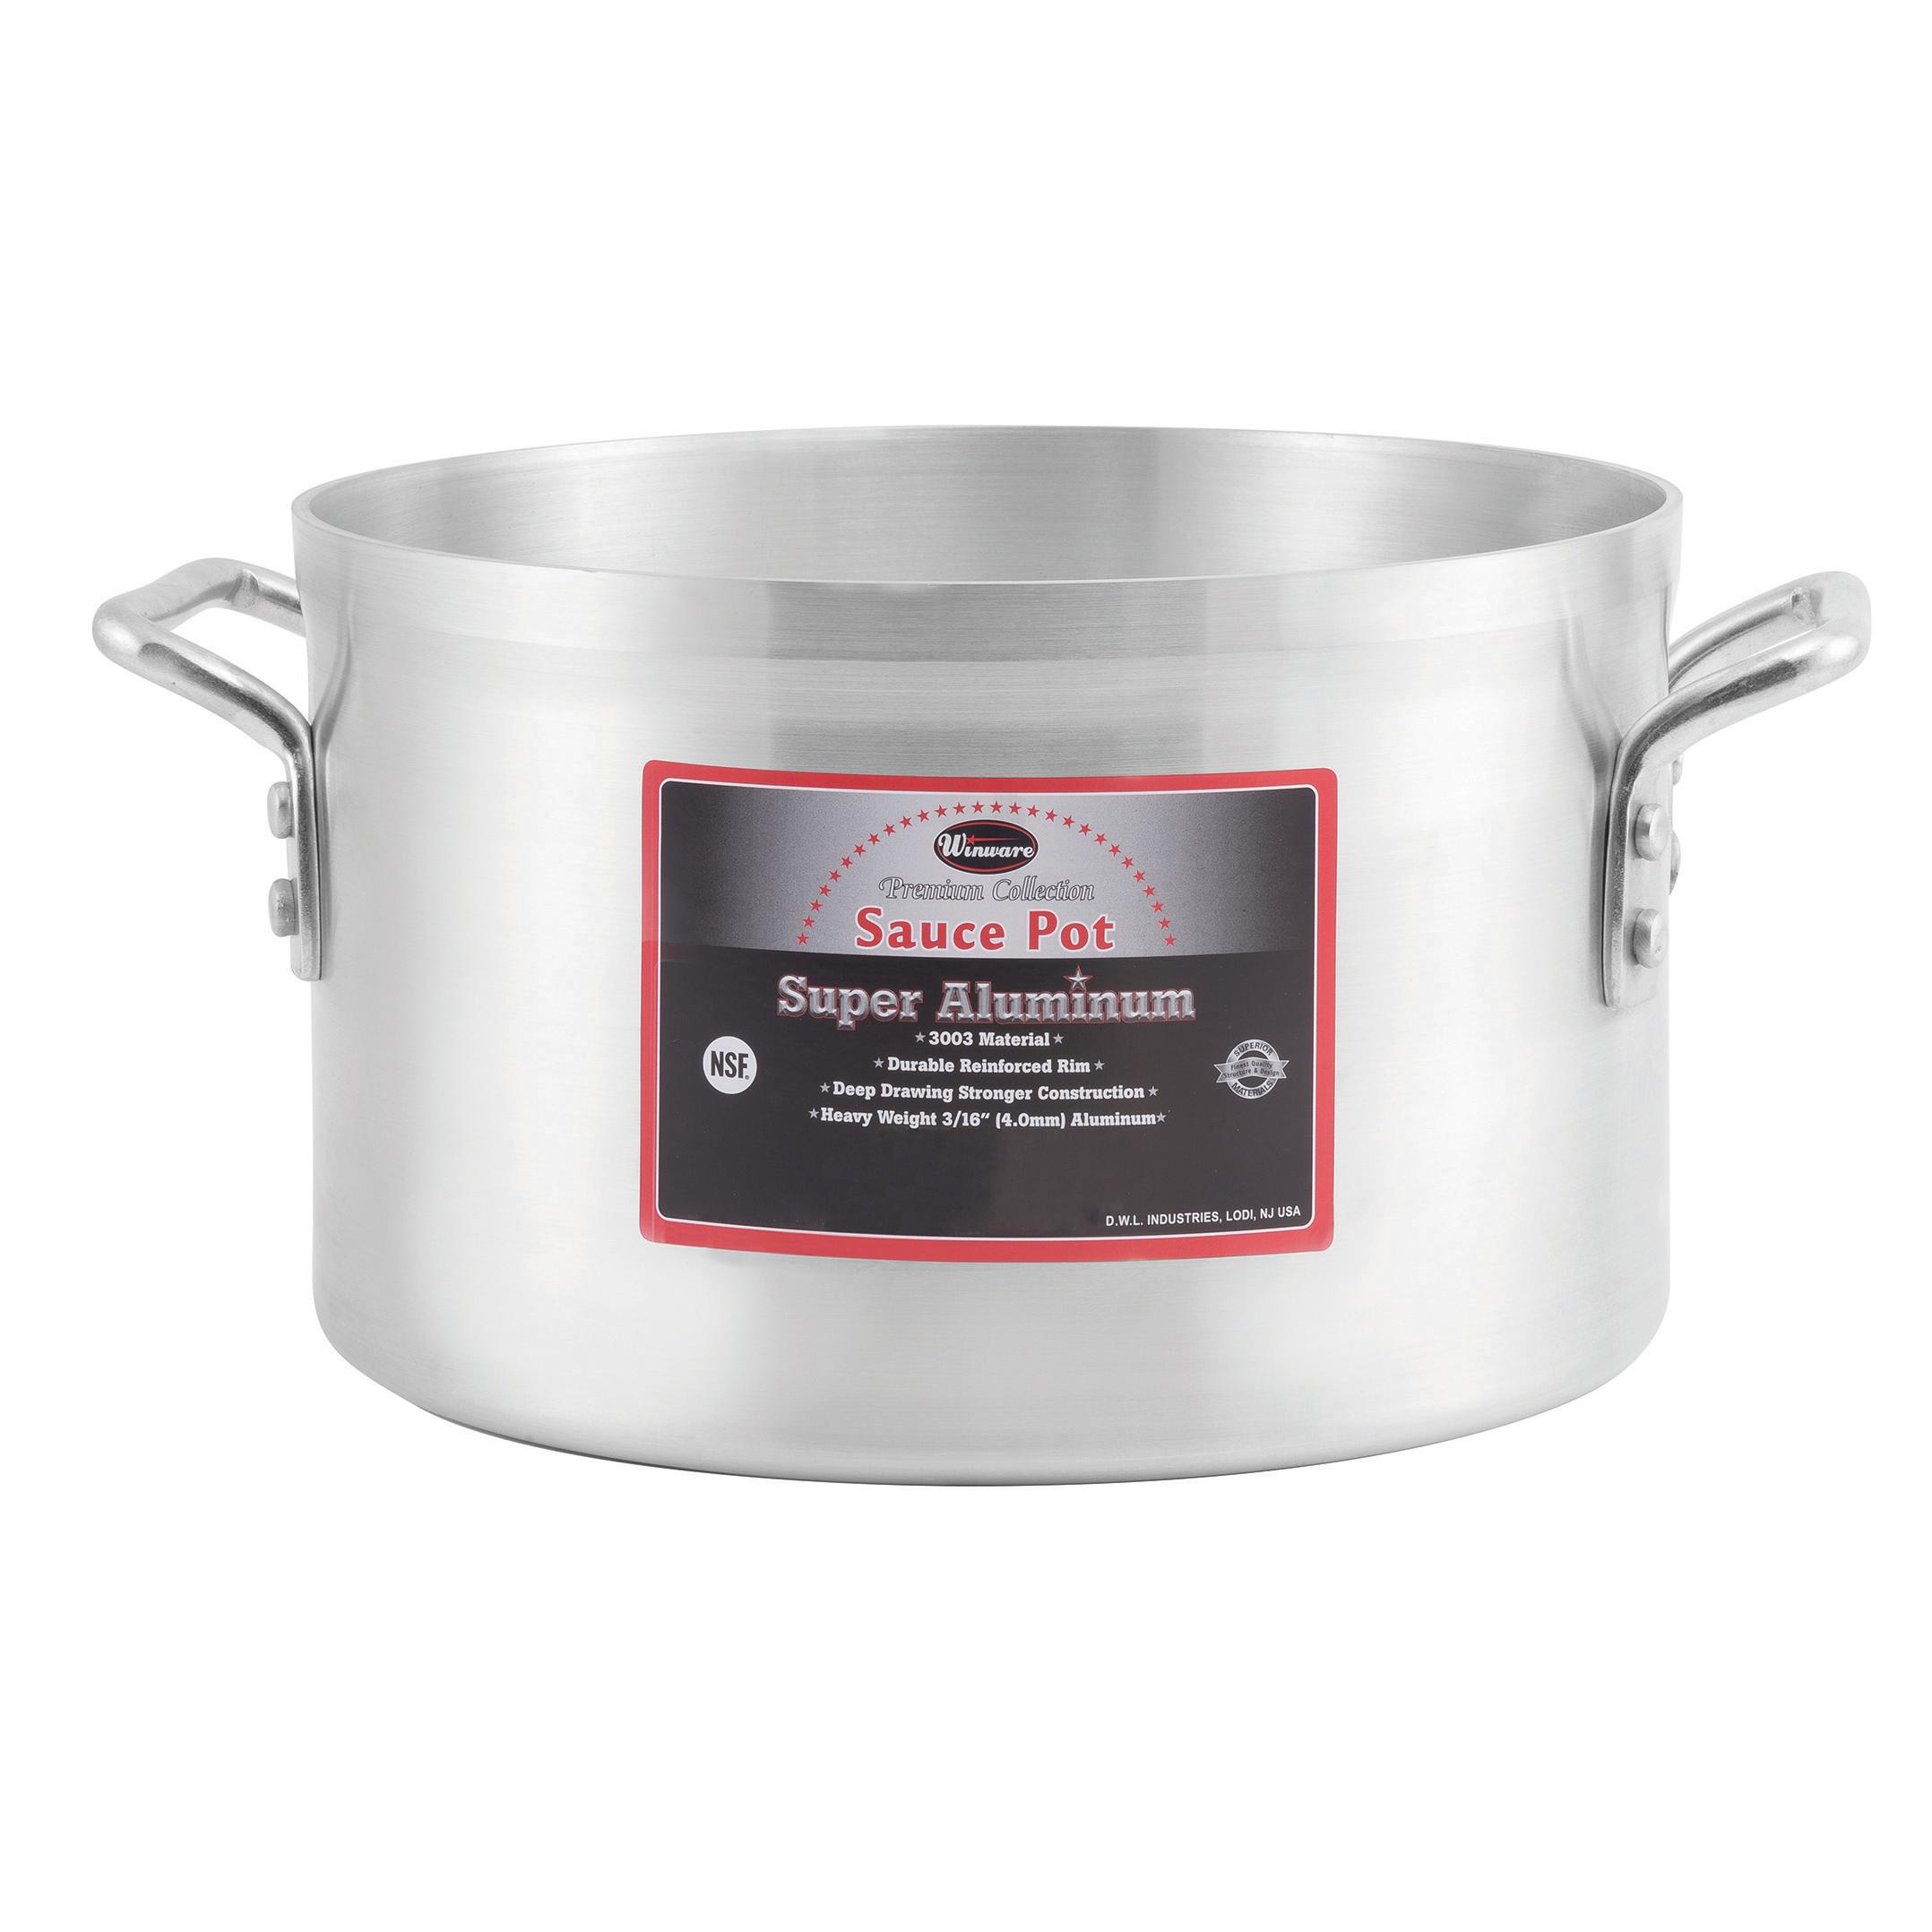 Winco AXAP-8 sauce pot